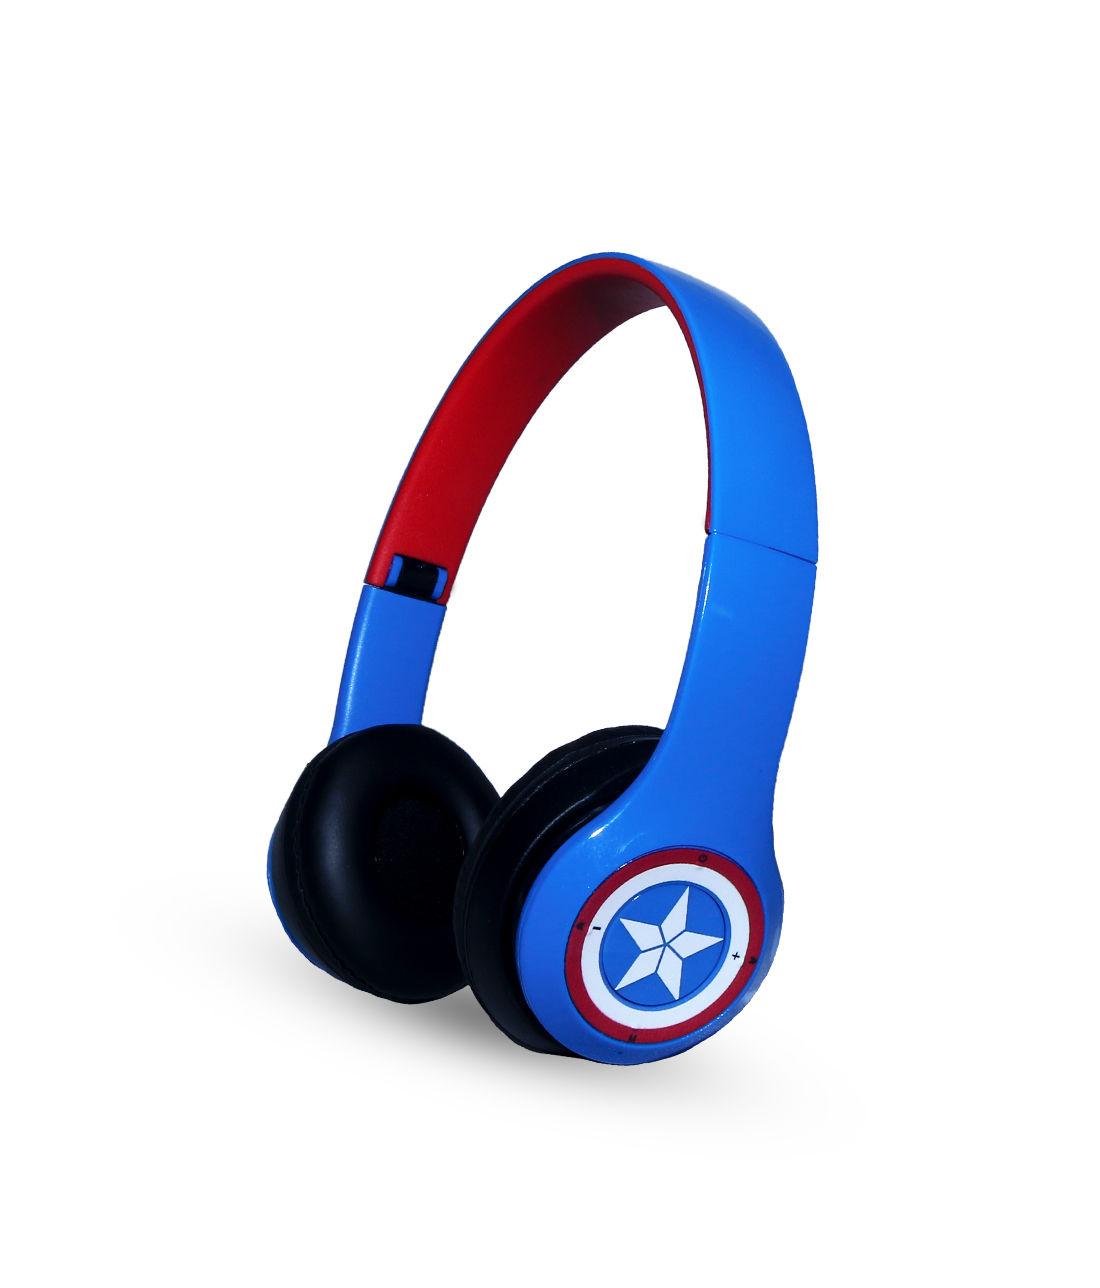 Cap Am Avenger - P47 Wireless On Ear Headphones